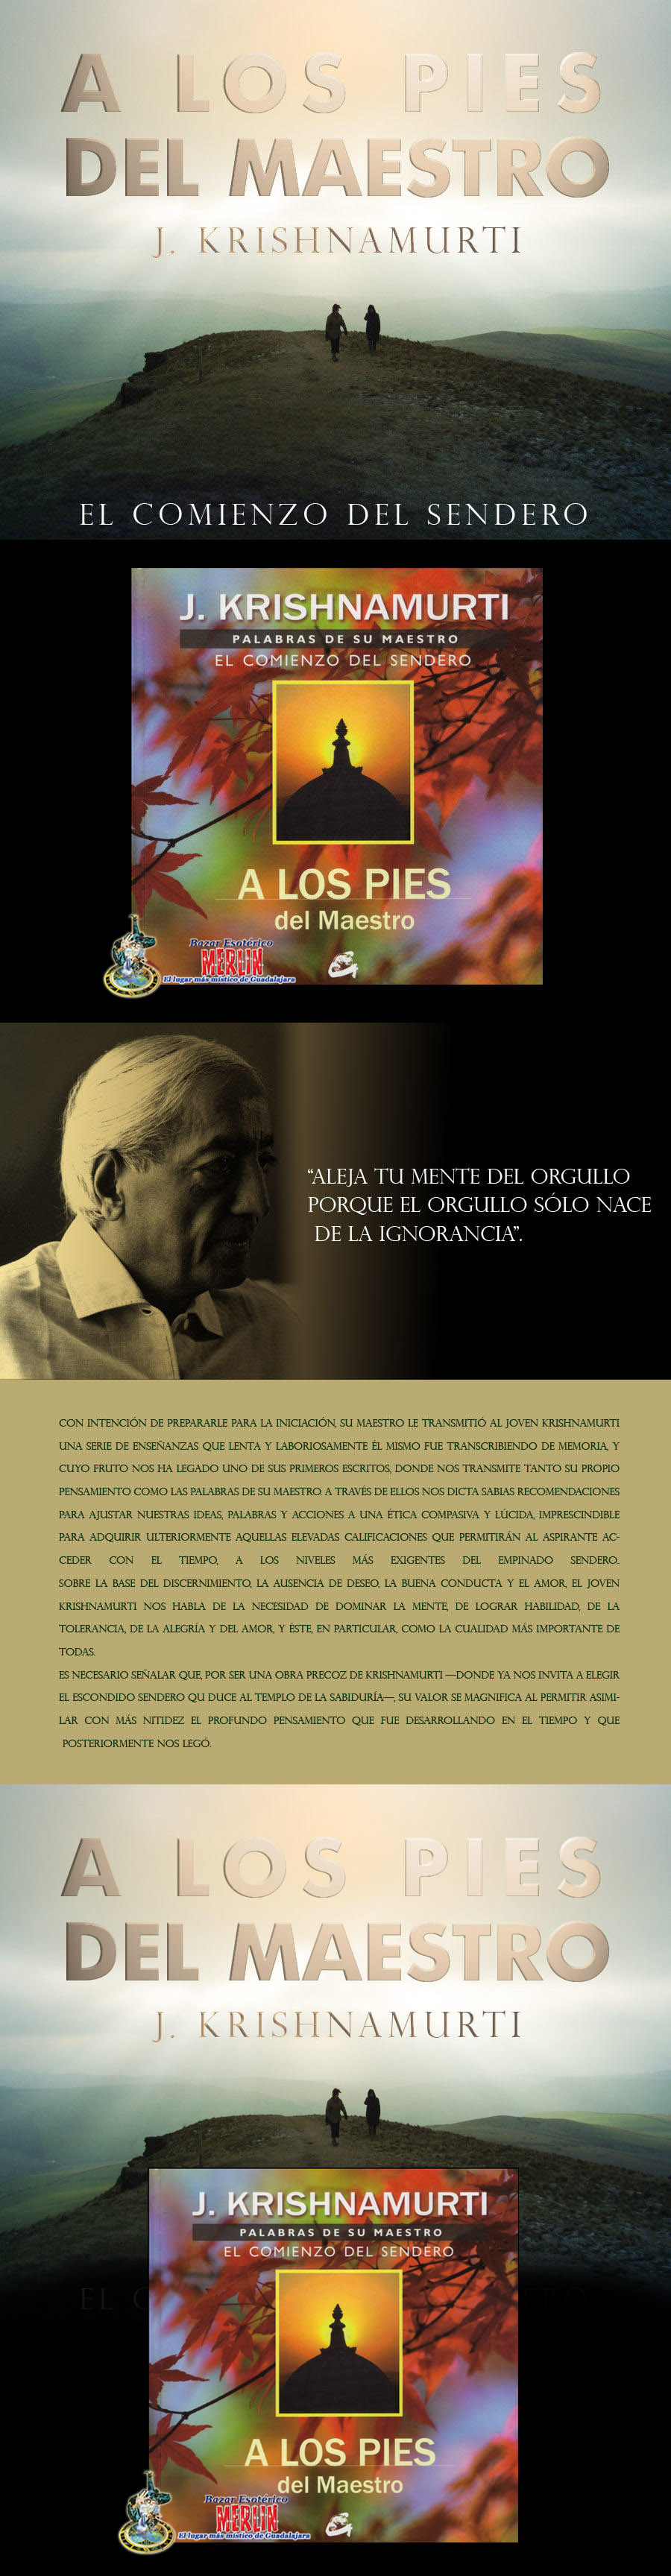 J Krishnamurti A Los Pies Del Maestro Diseno 01